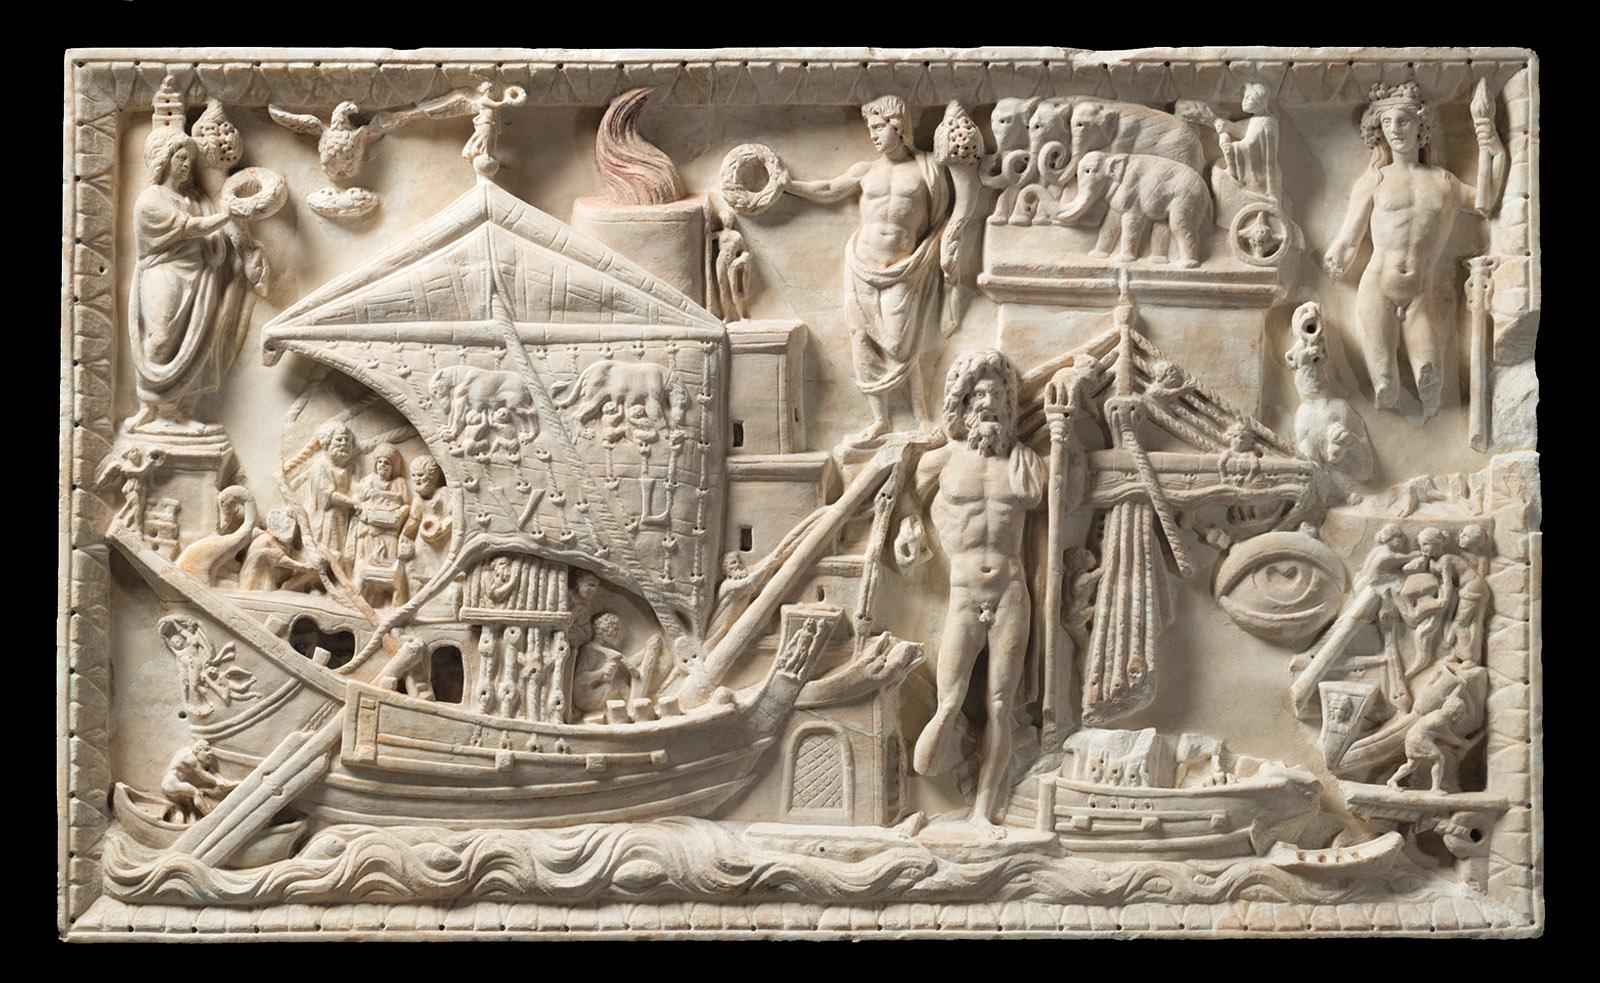 Bas relief of the port of Rome, circa 200 CE